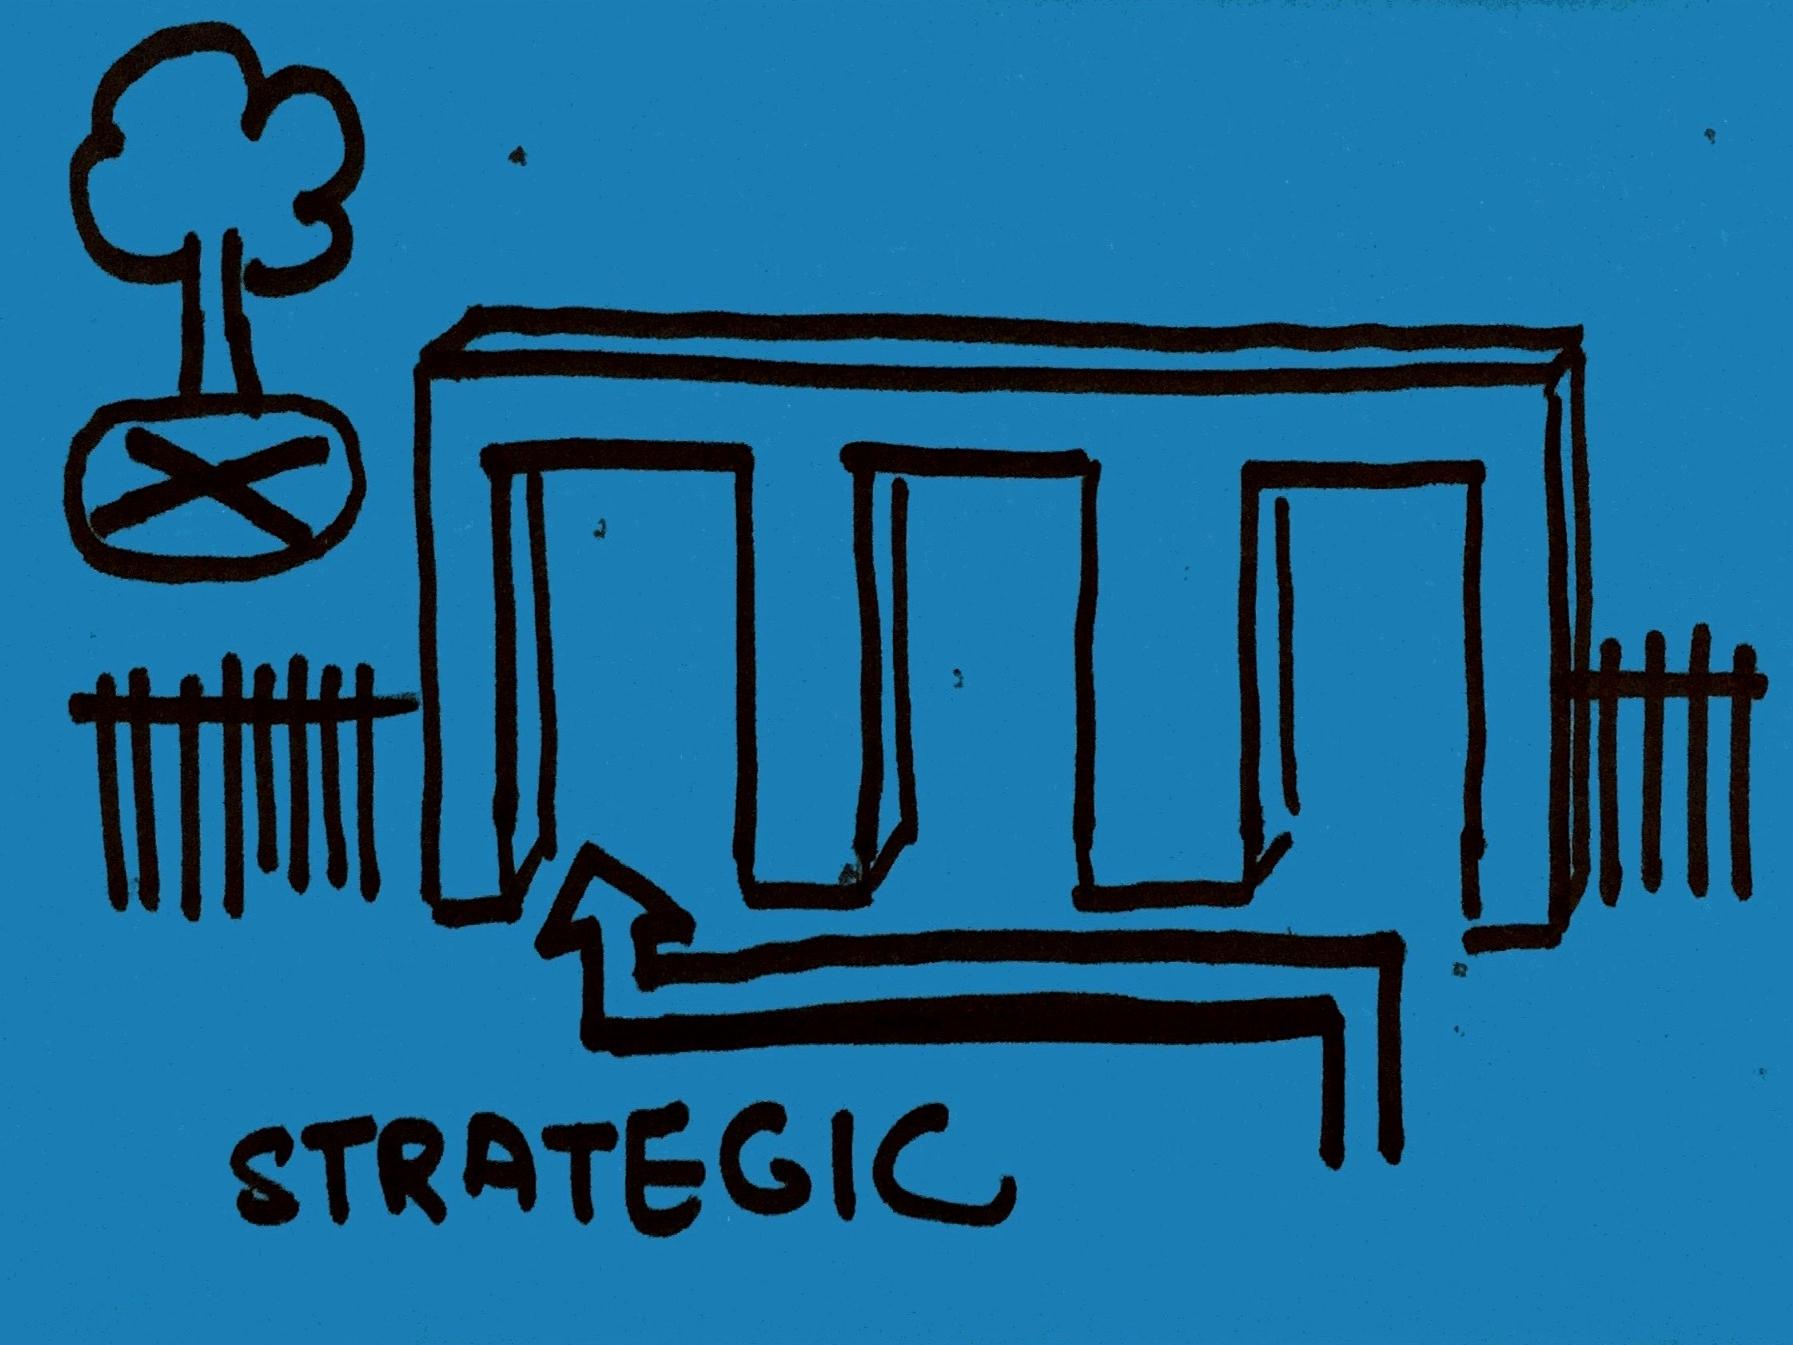 Strengthsfinder Singapore Strengths School Strategic 2.jpg